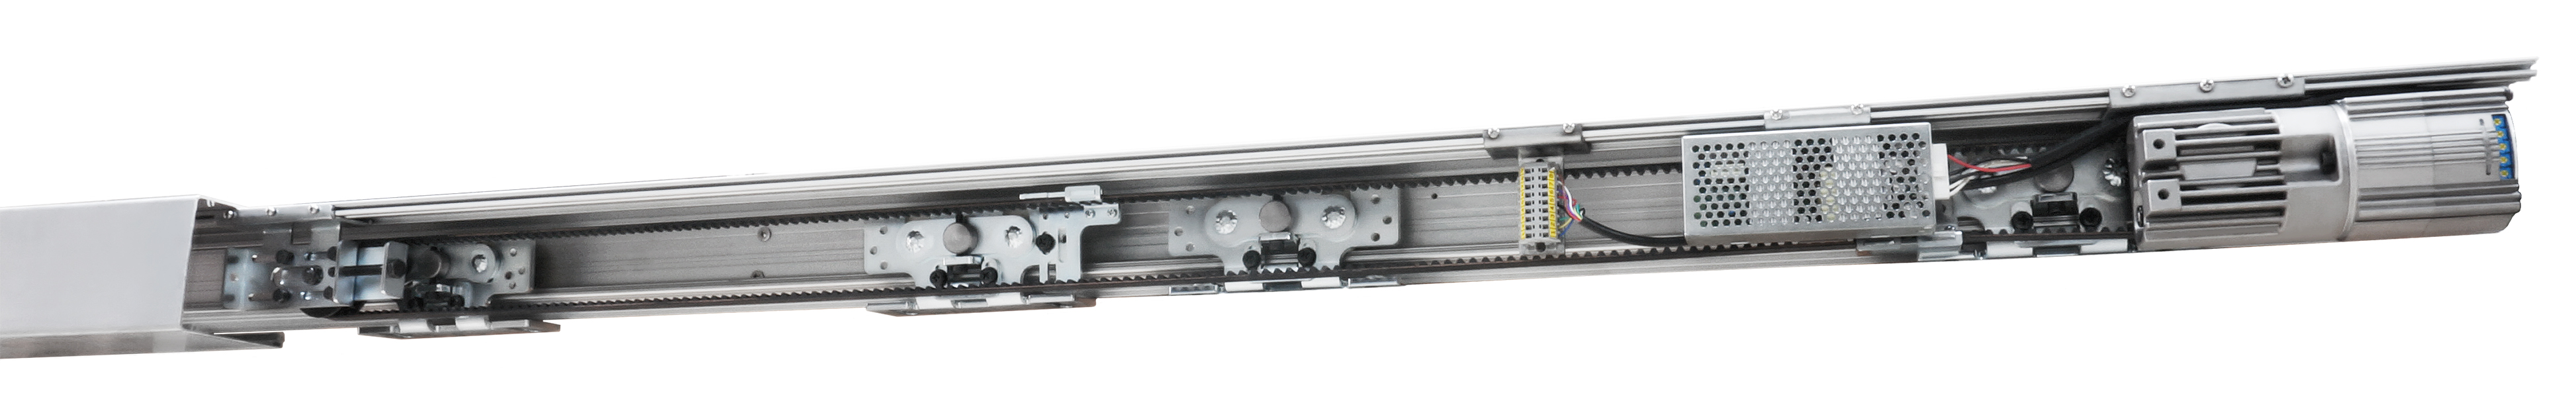 CSmini2-S72 Automatic Sliding Door System / TRONCO ELECTRIC MACHINERY INC